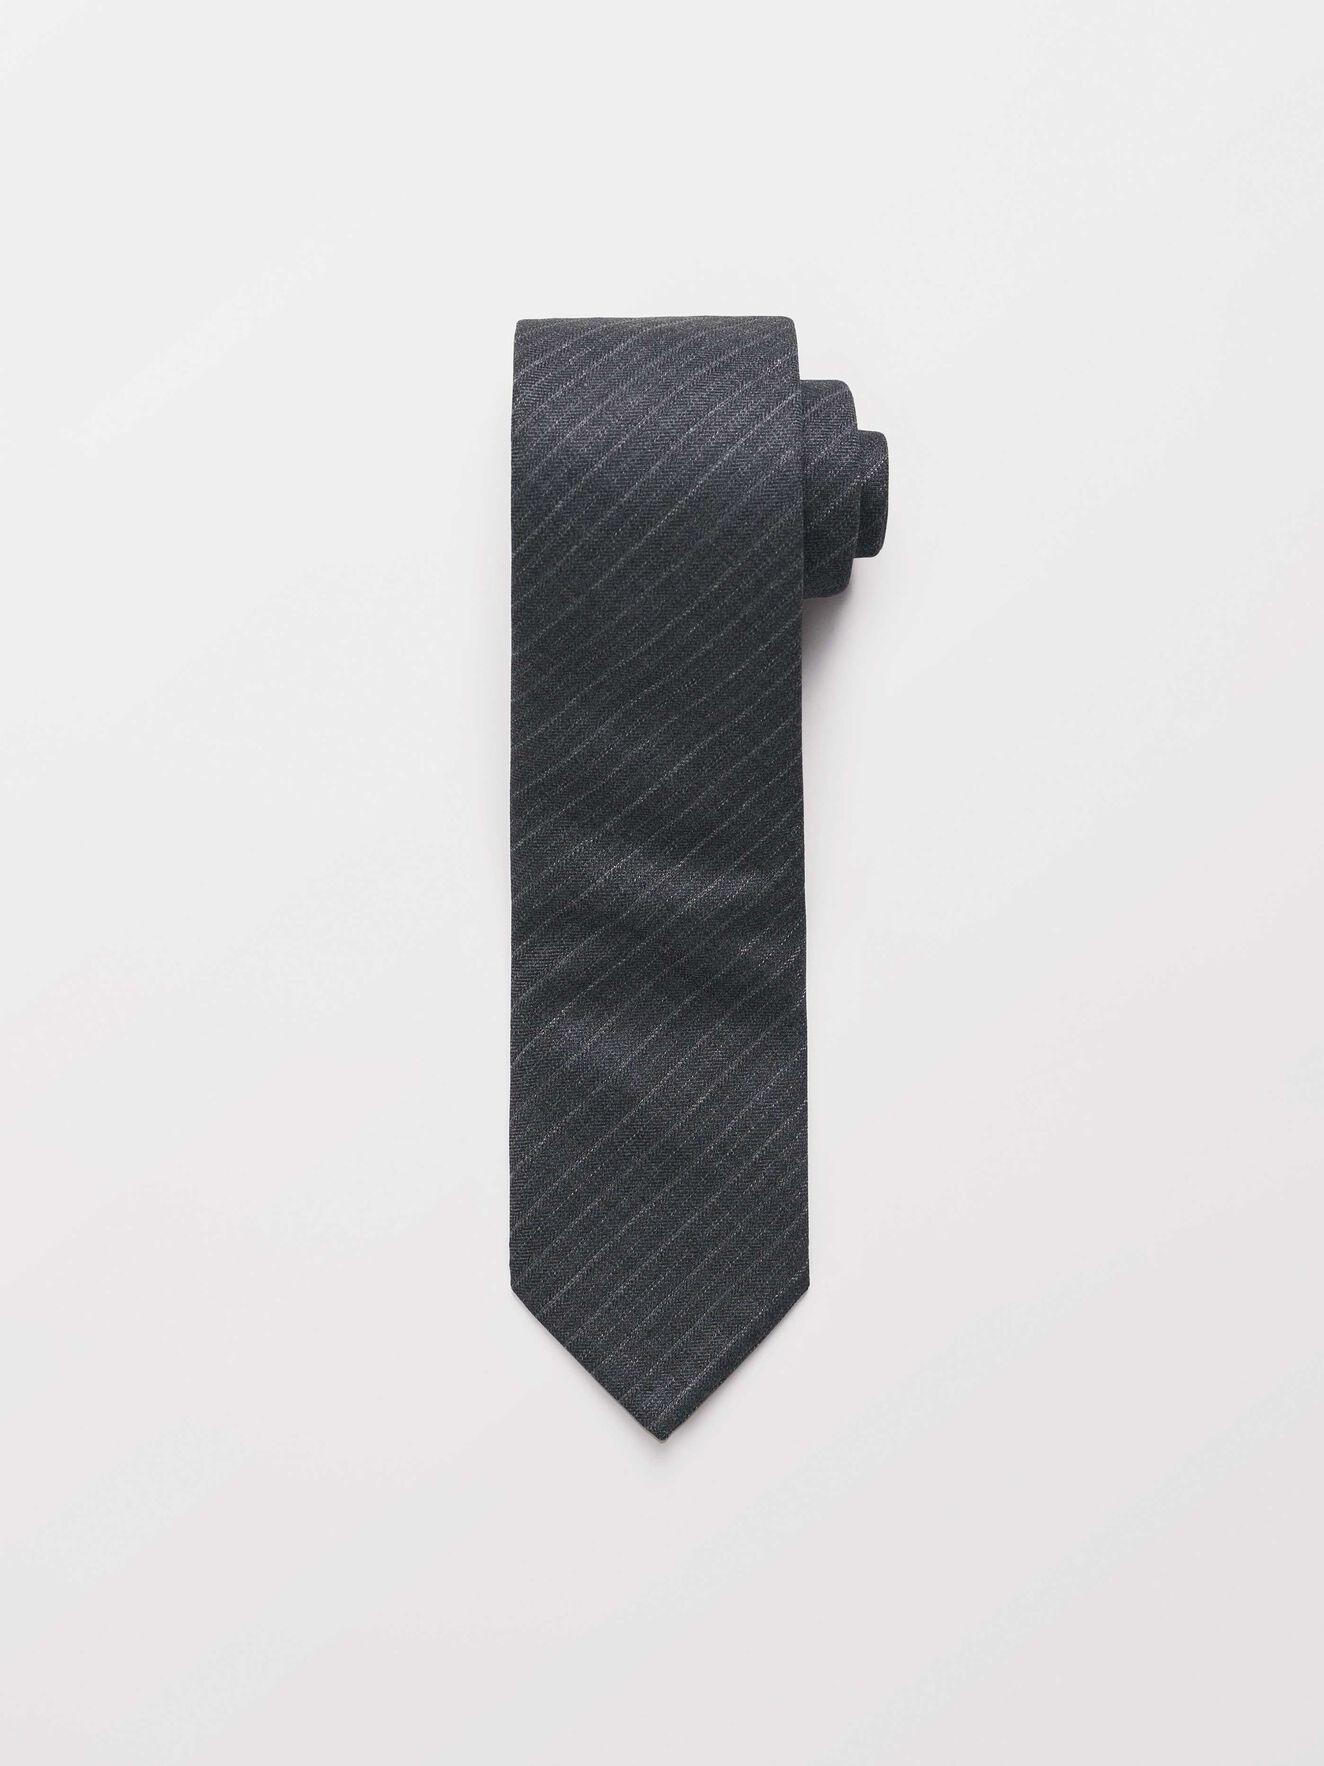 Tannant Tie in Dark grey Mel from Tiger of Sweden